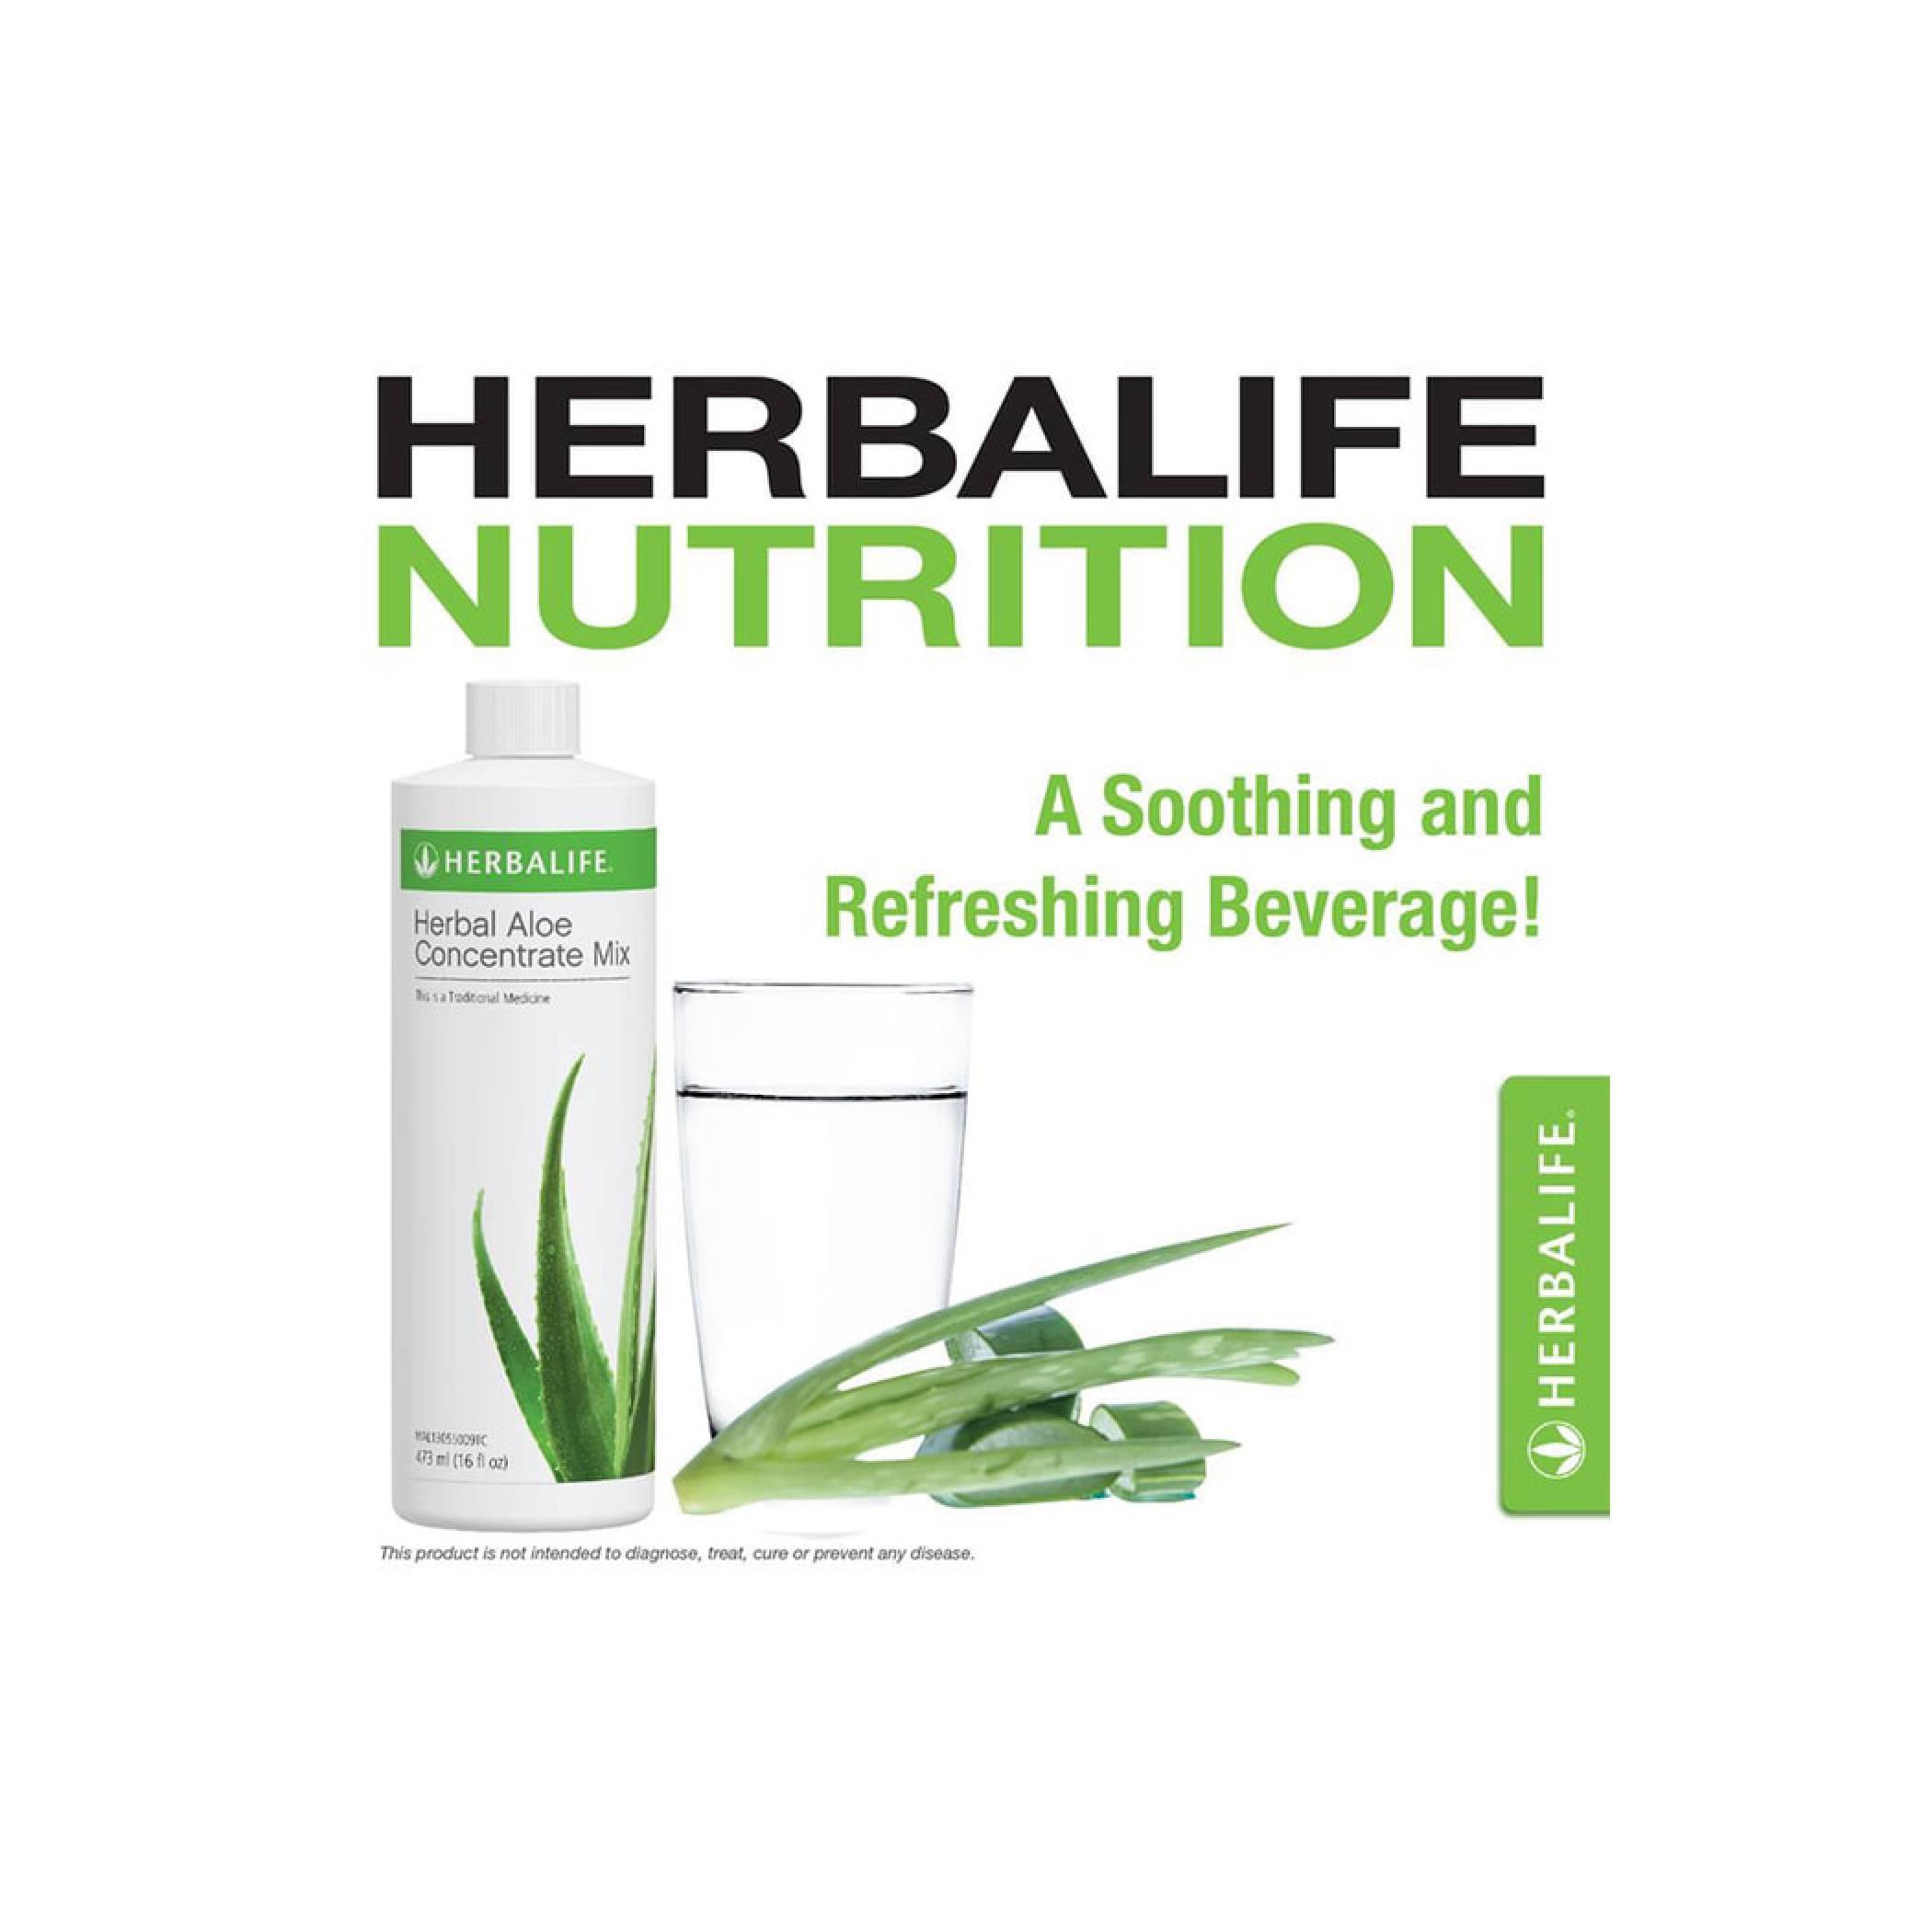 Herbal Aloe Concentrate # Herbal Aloe # Herballife # Herbal life Aloe